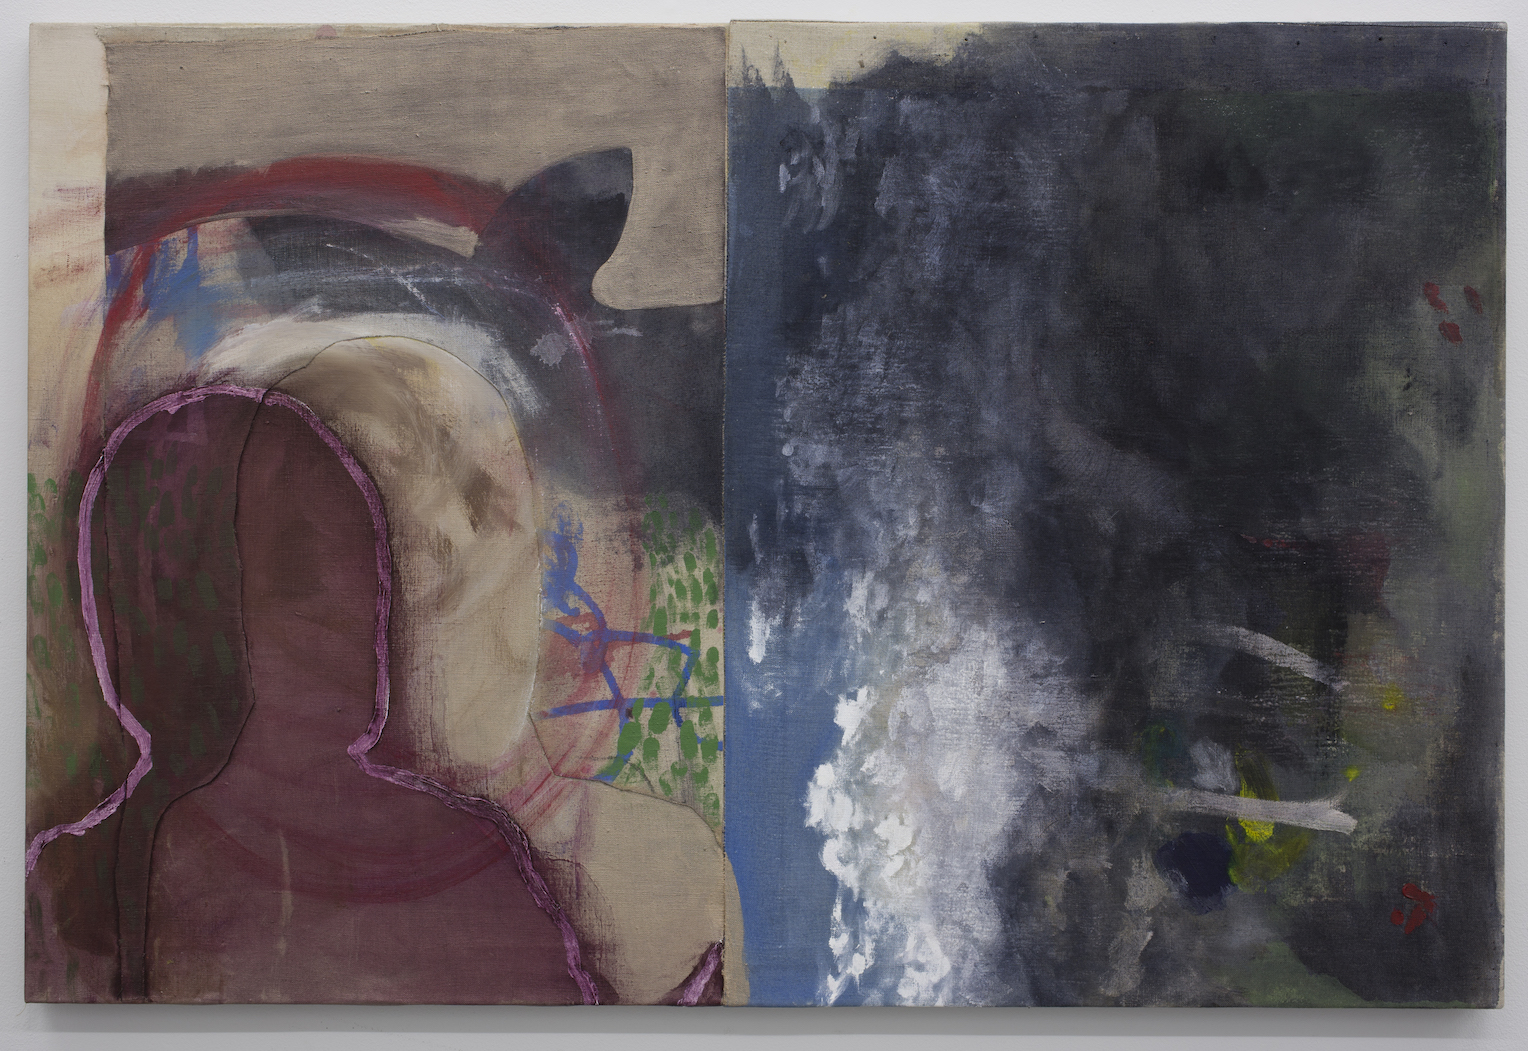 Couple Argue Over Rotated Landscape.  Acrylic on Linen, 101x61cm, 2013.